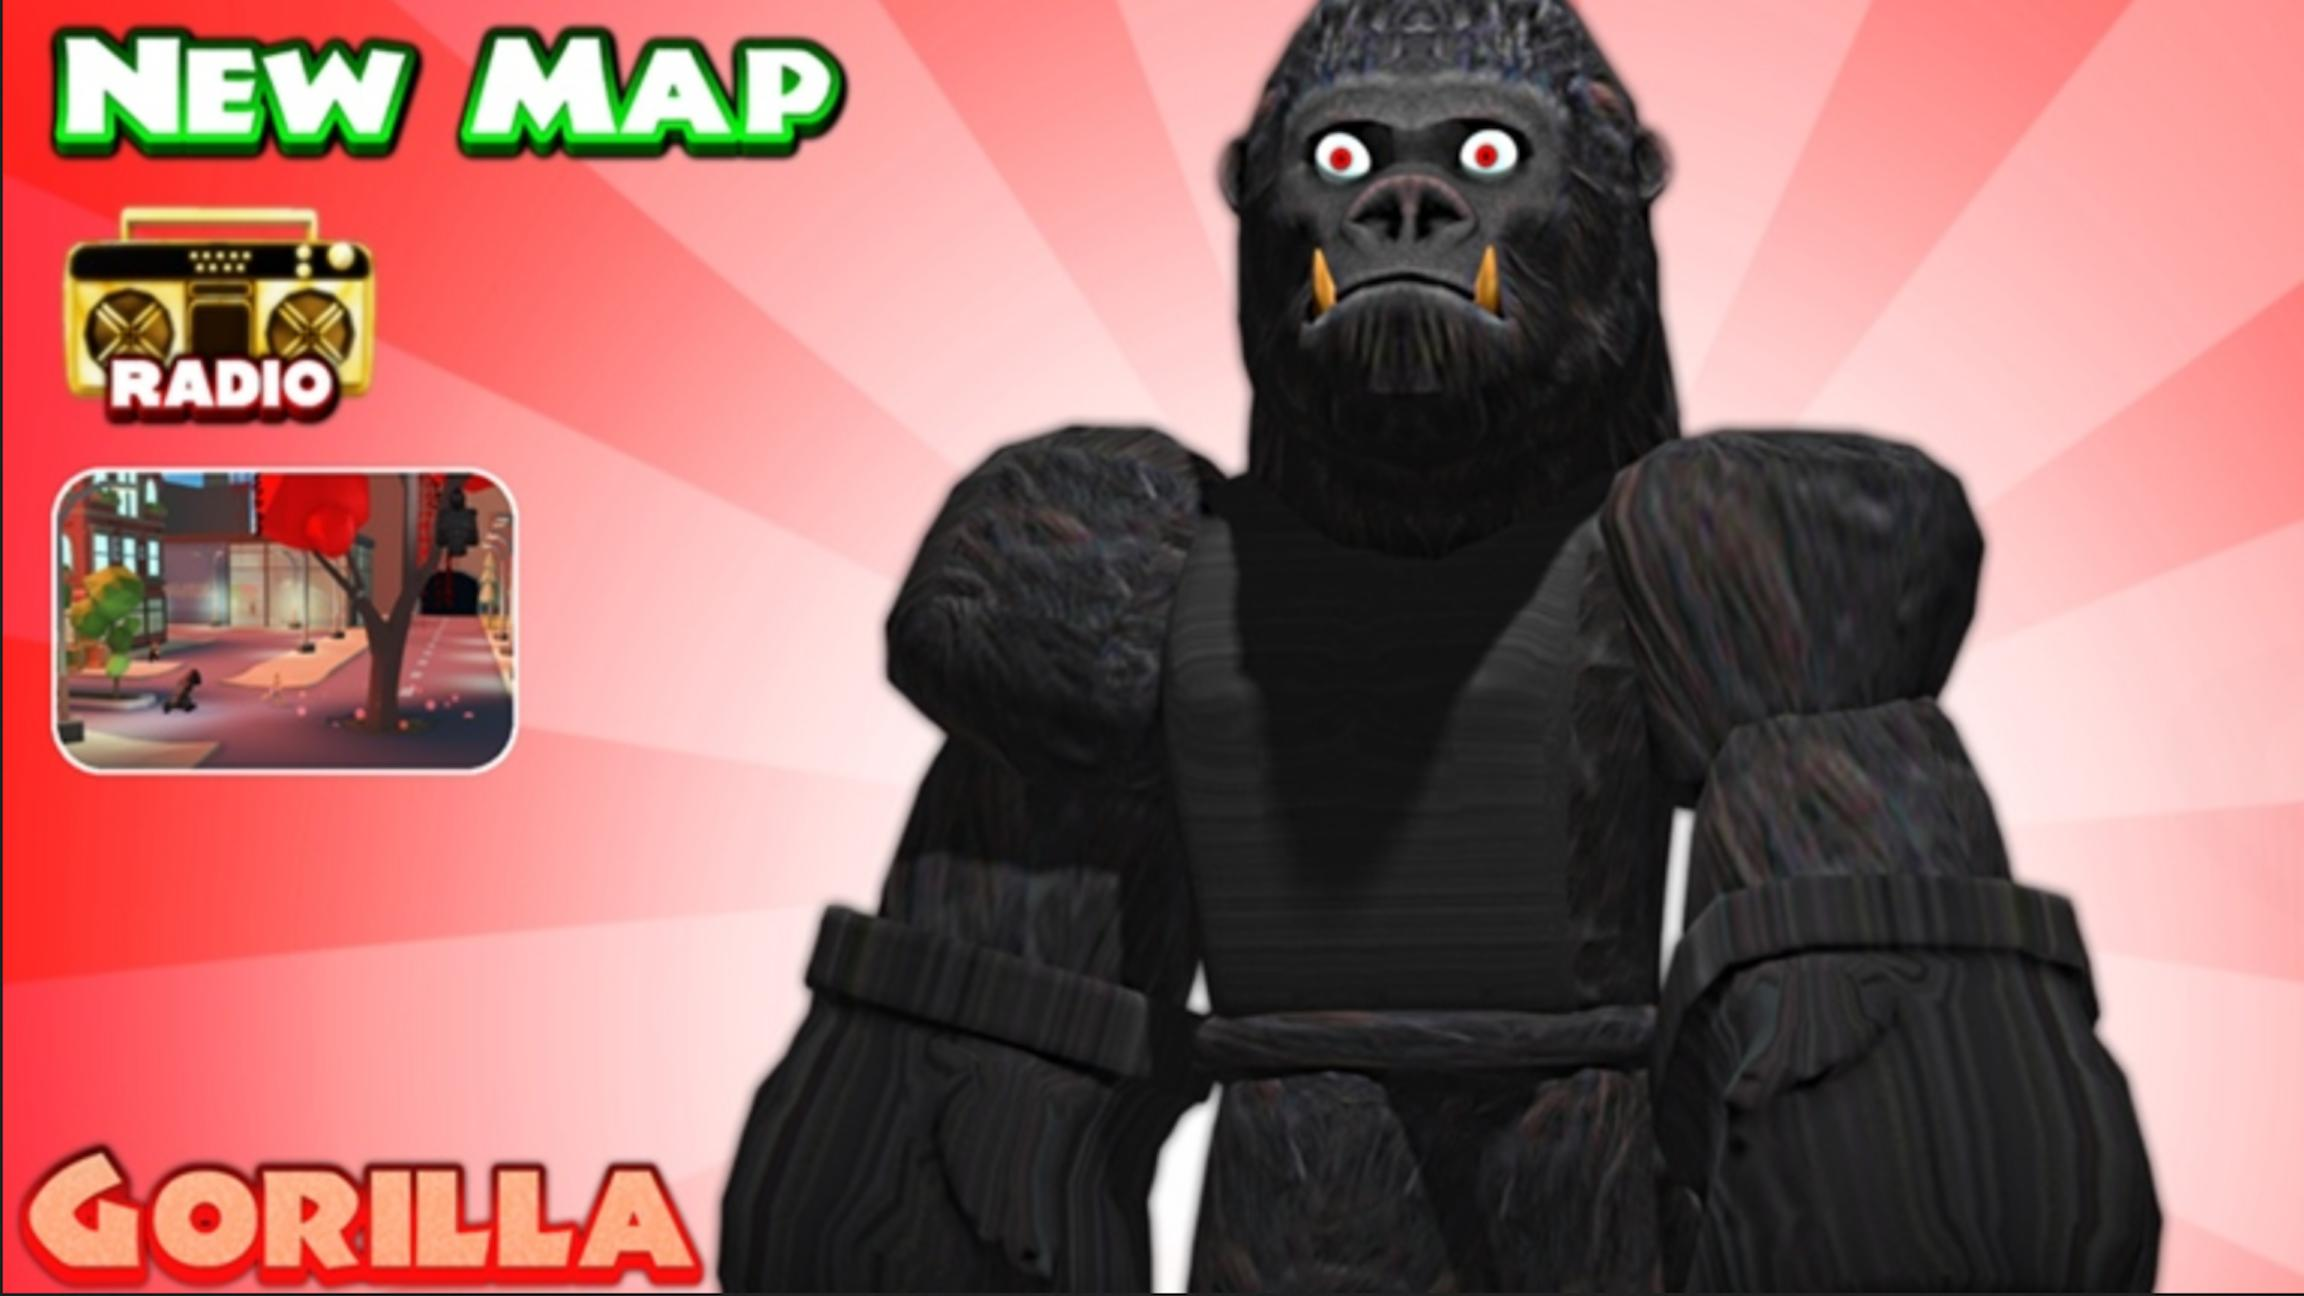 Gorilla Codes